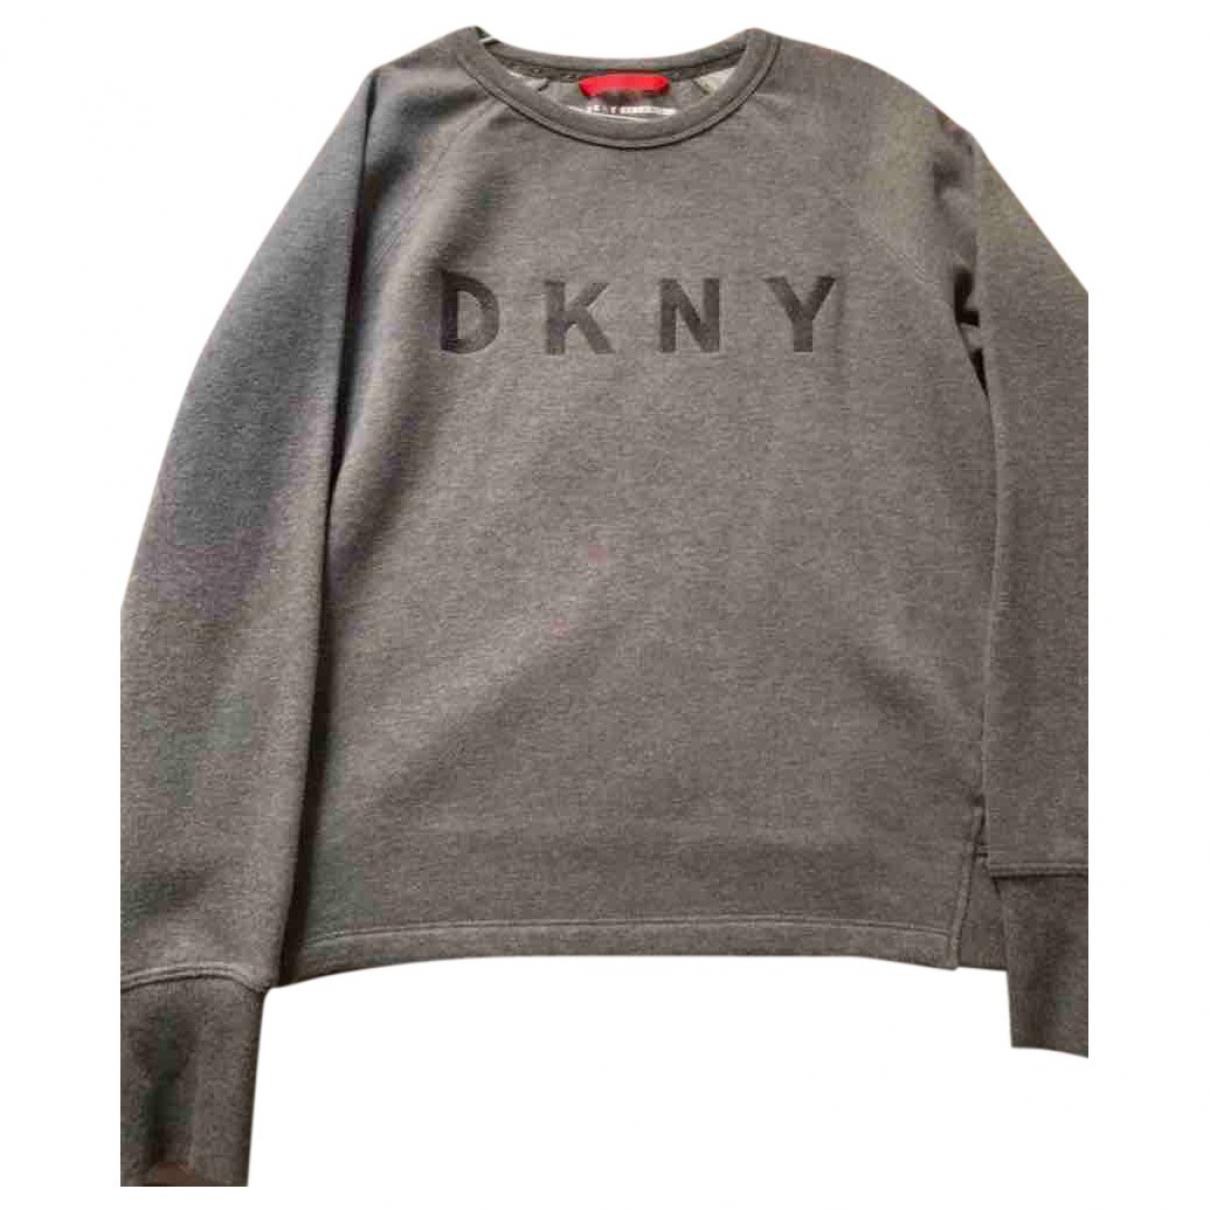 Dkny \N Grey Cotton Knitwear for Women M International